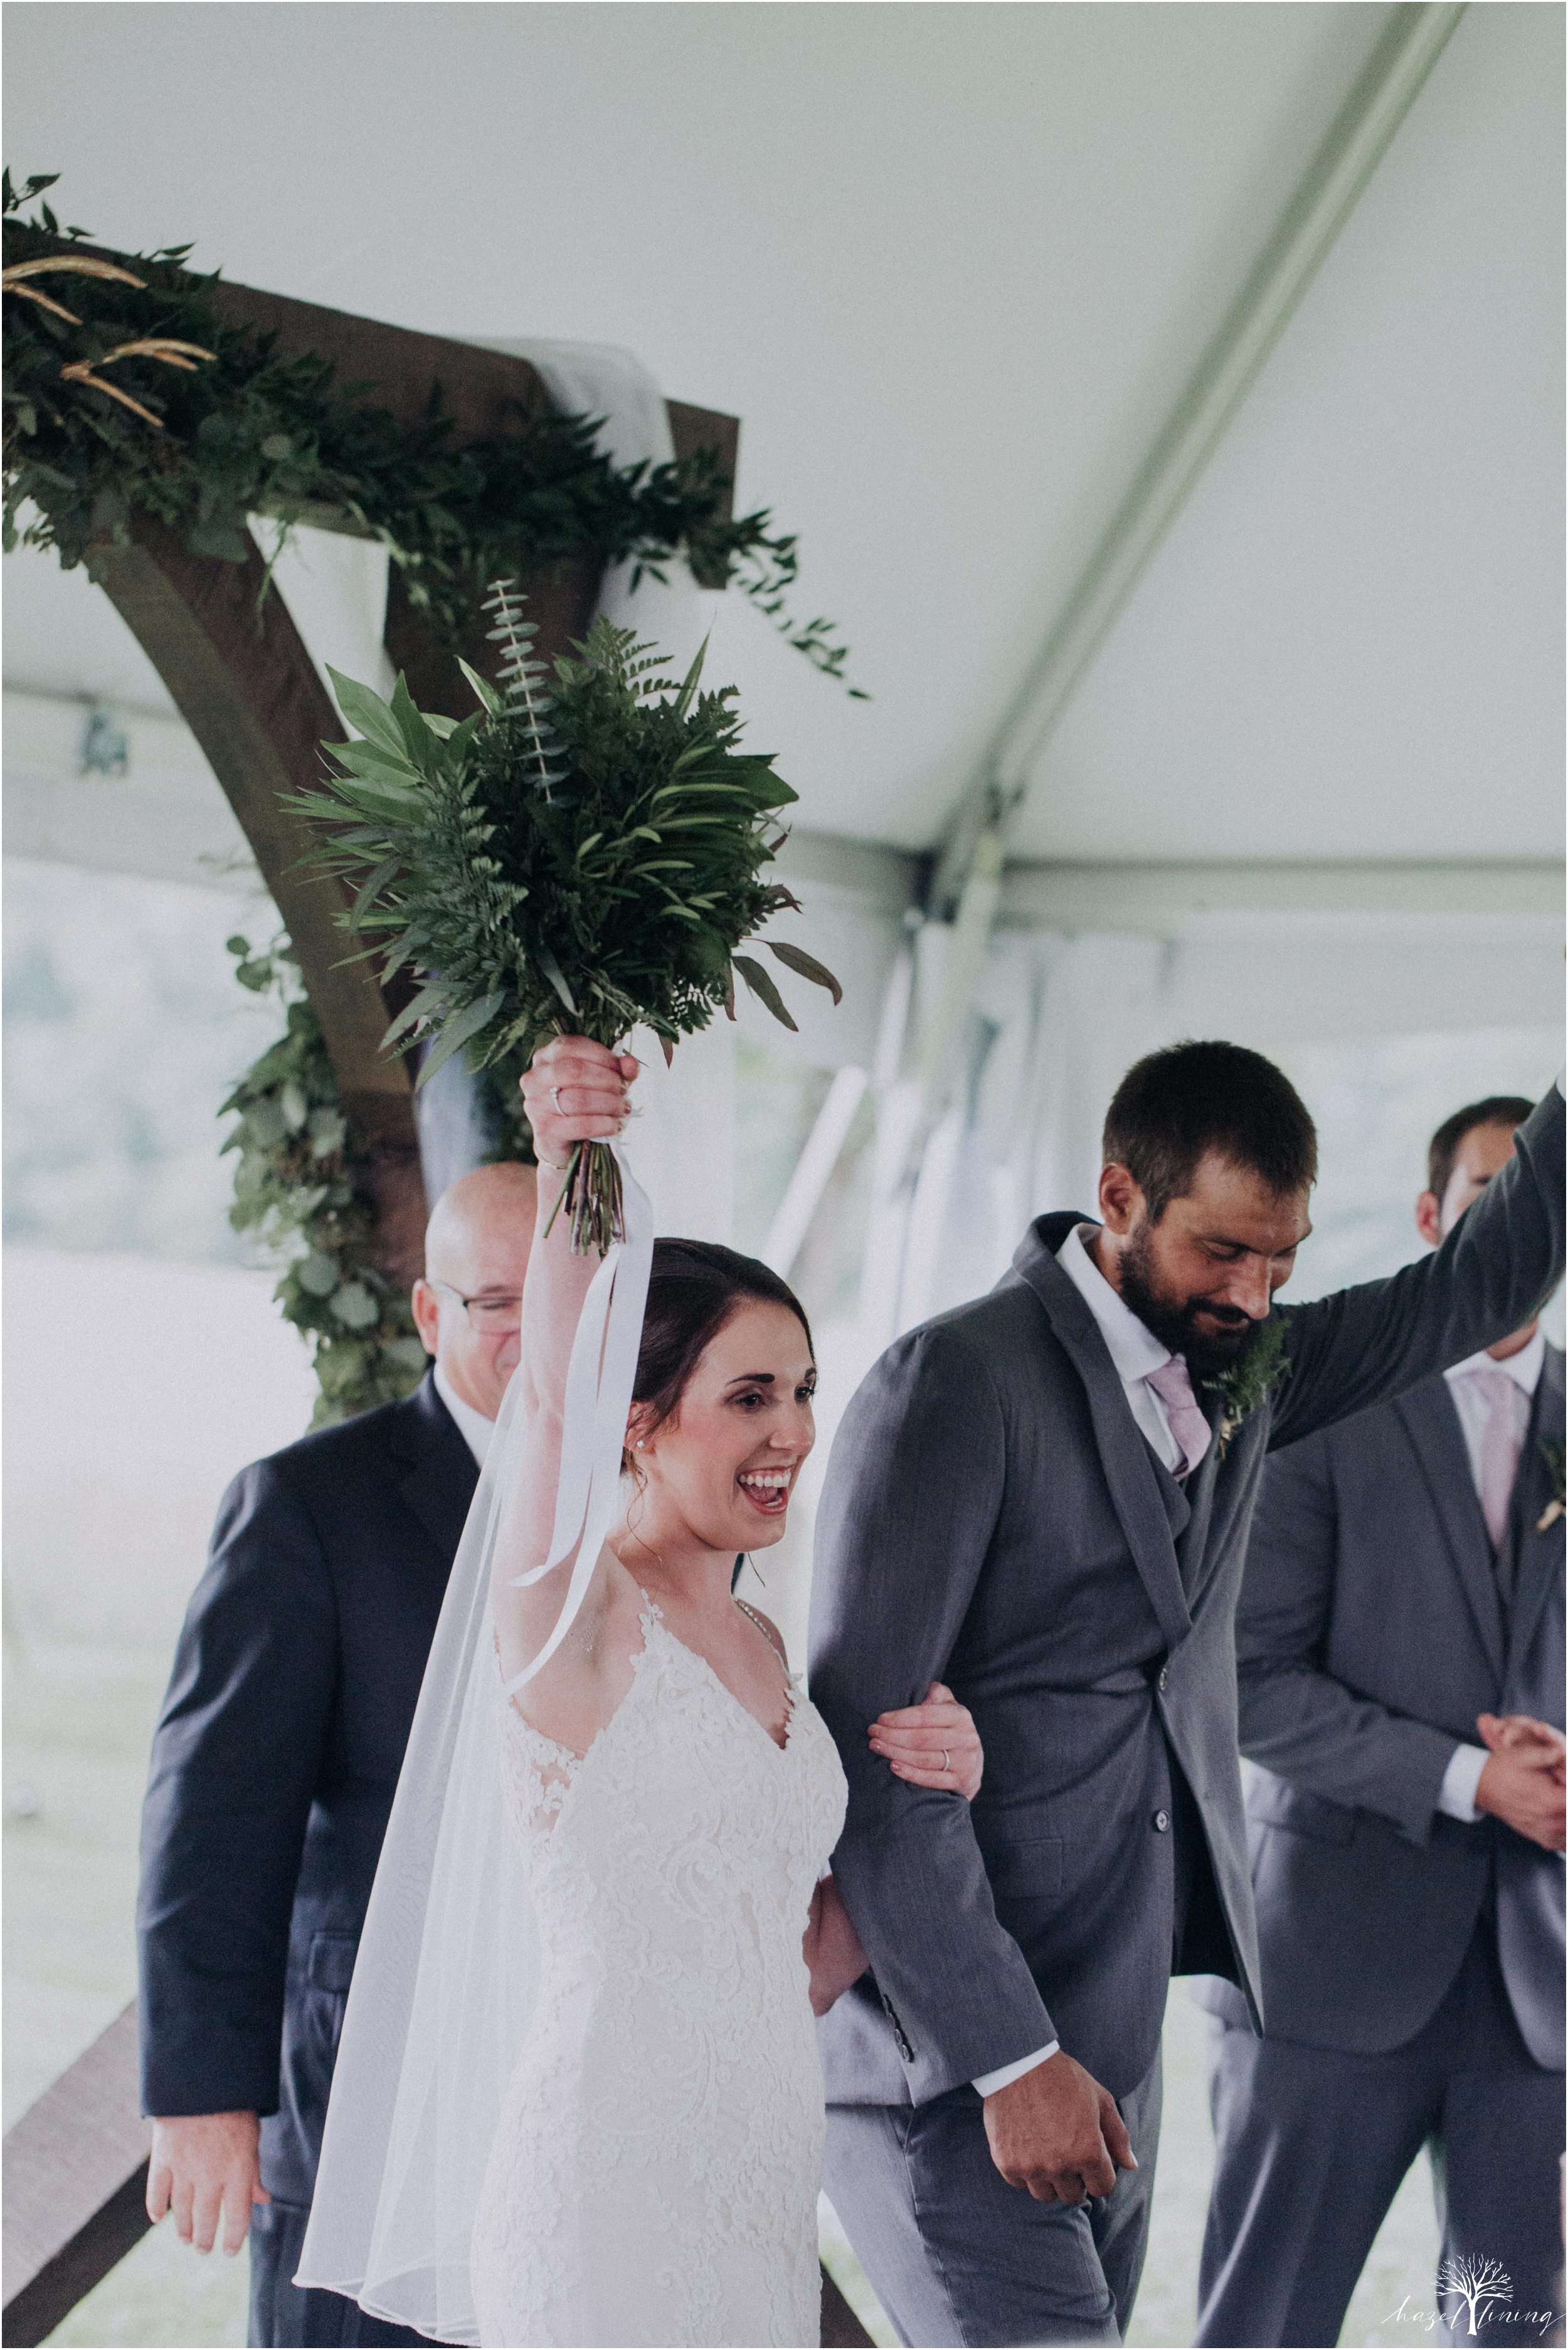 hazel-lining-travel-wedding-elopement-photography-lisa-landon-shoemaker-the-farm-bakery-and-events-bucks-county-quakertown-pennsylvania-summer-country-outdoor-farm-wedding_0066.jpg